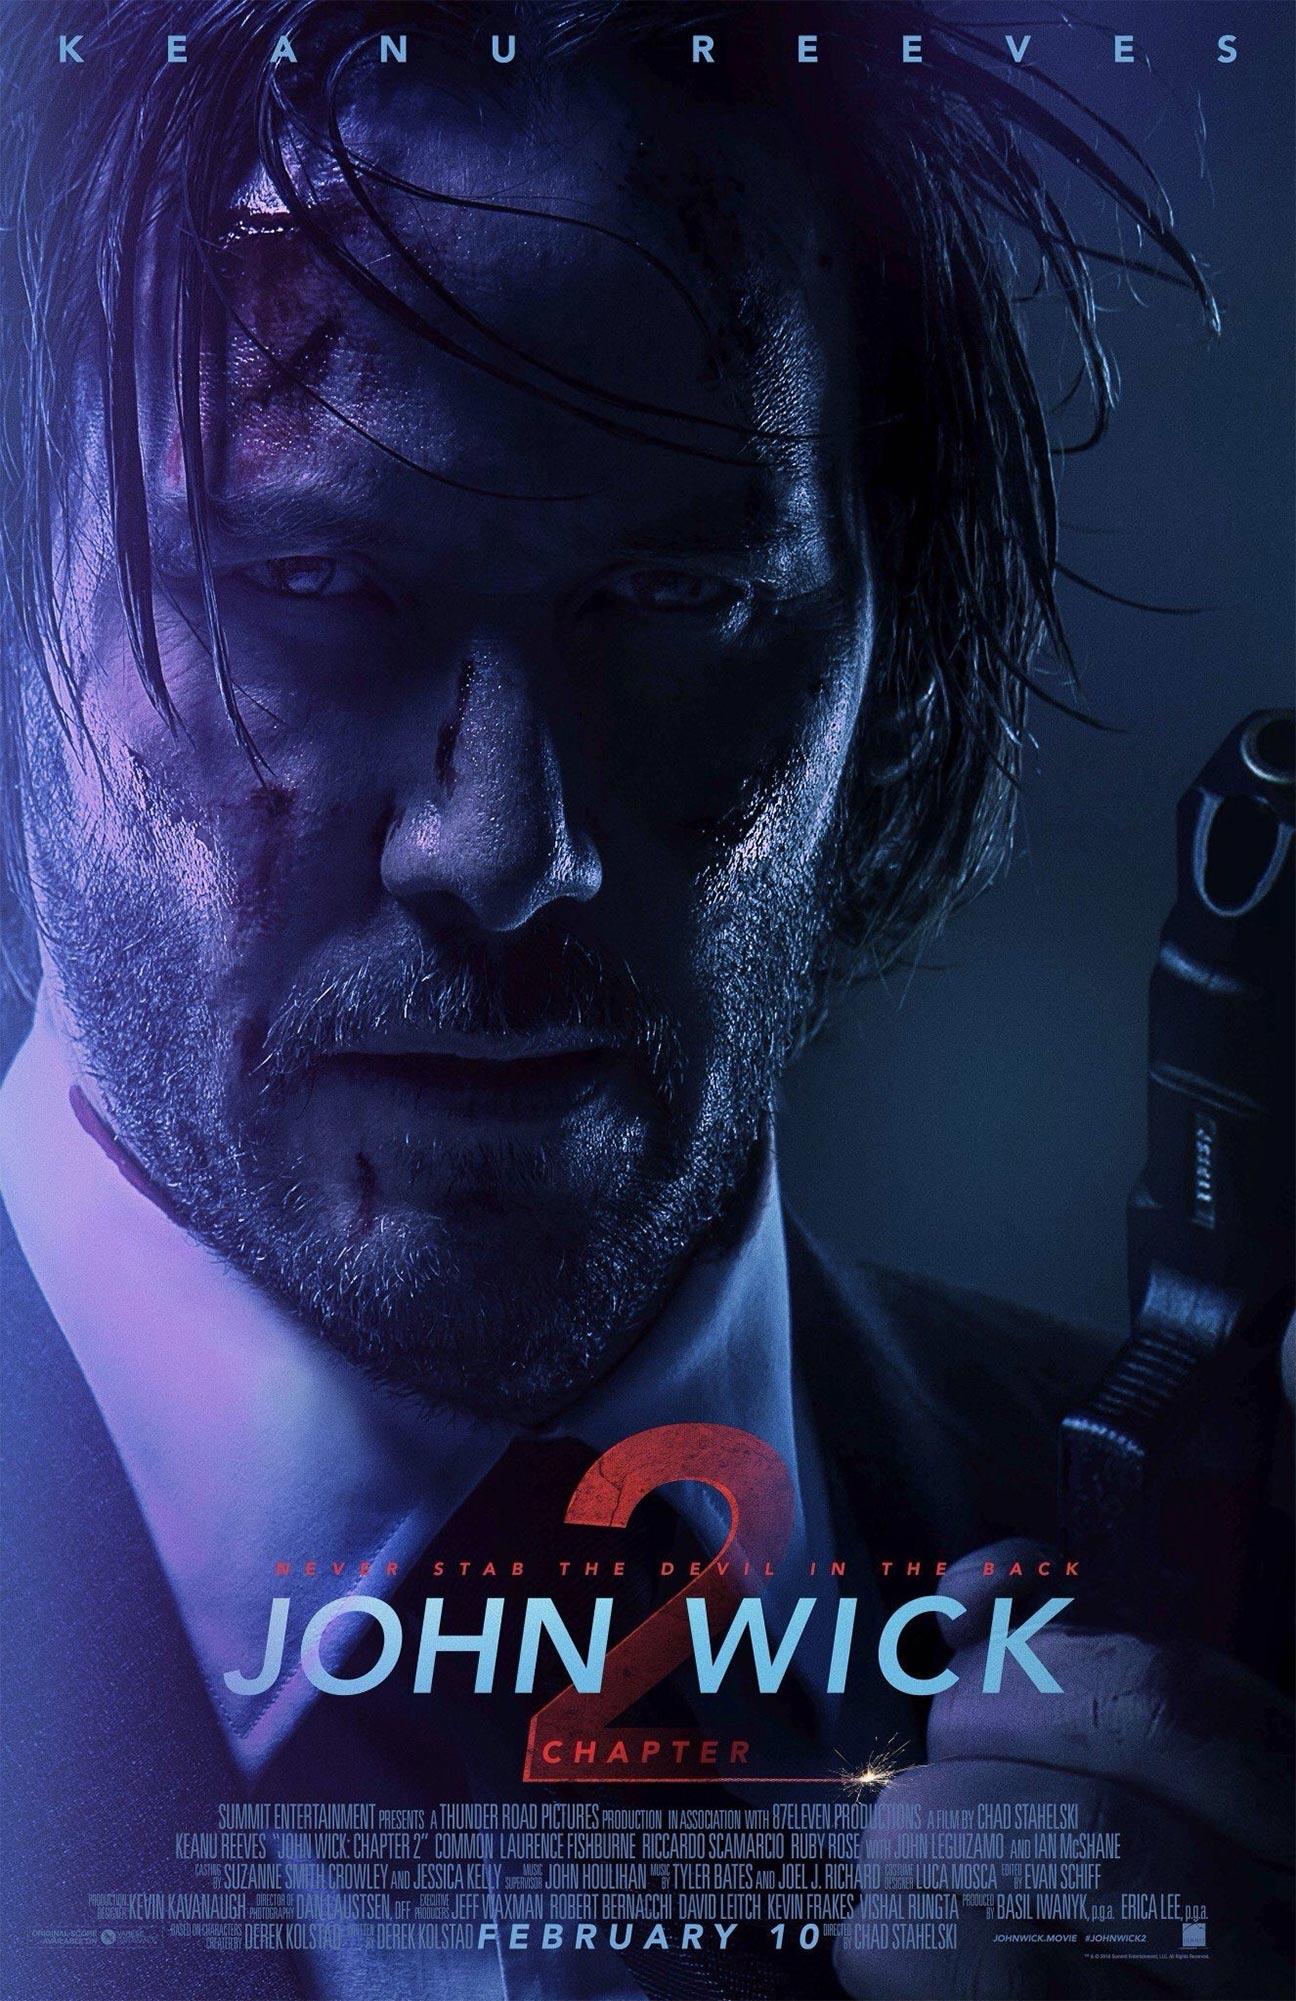 John Wick: Chapter 2 Poster #4